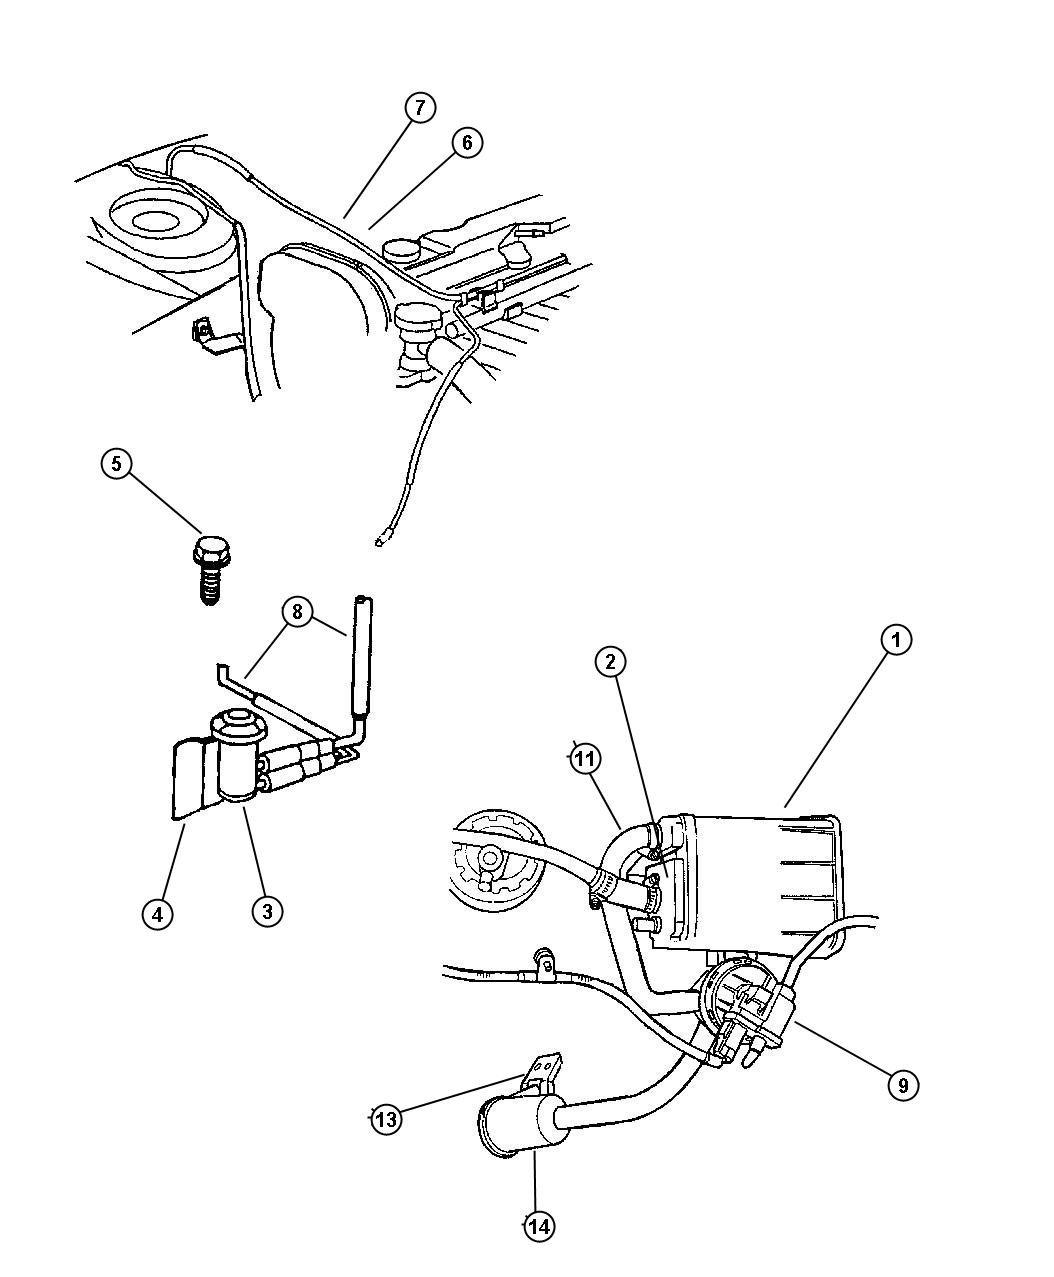 Dodge Stratus Pump. Leak detection. Emissions, canister